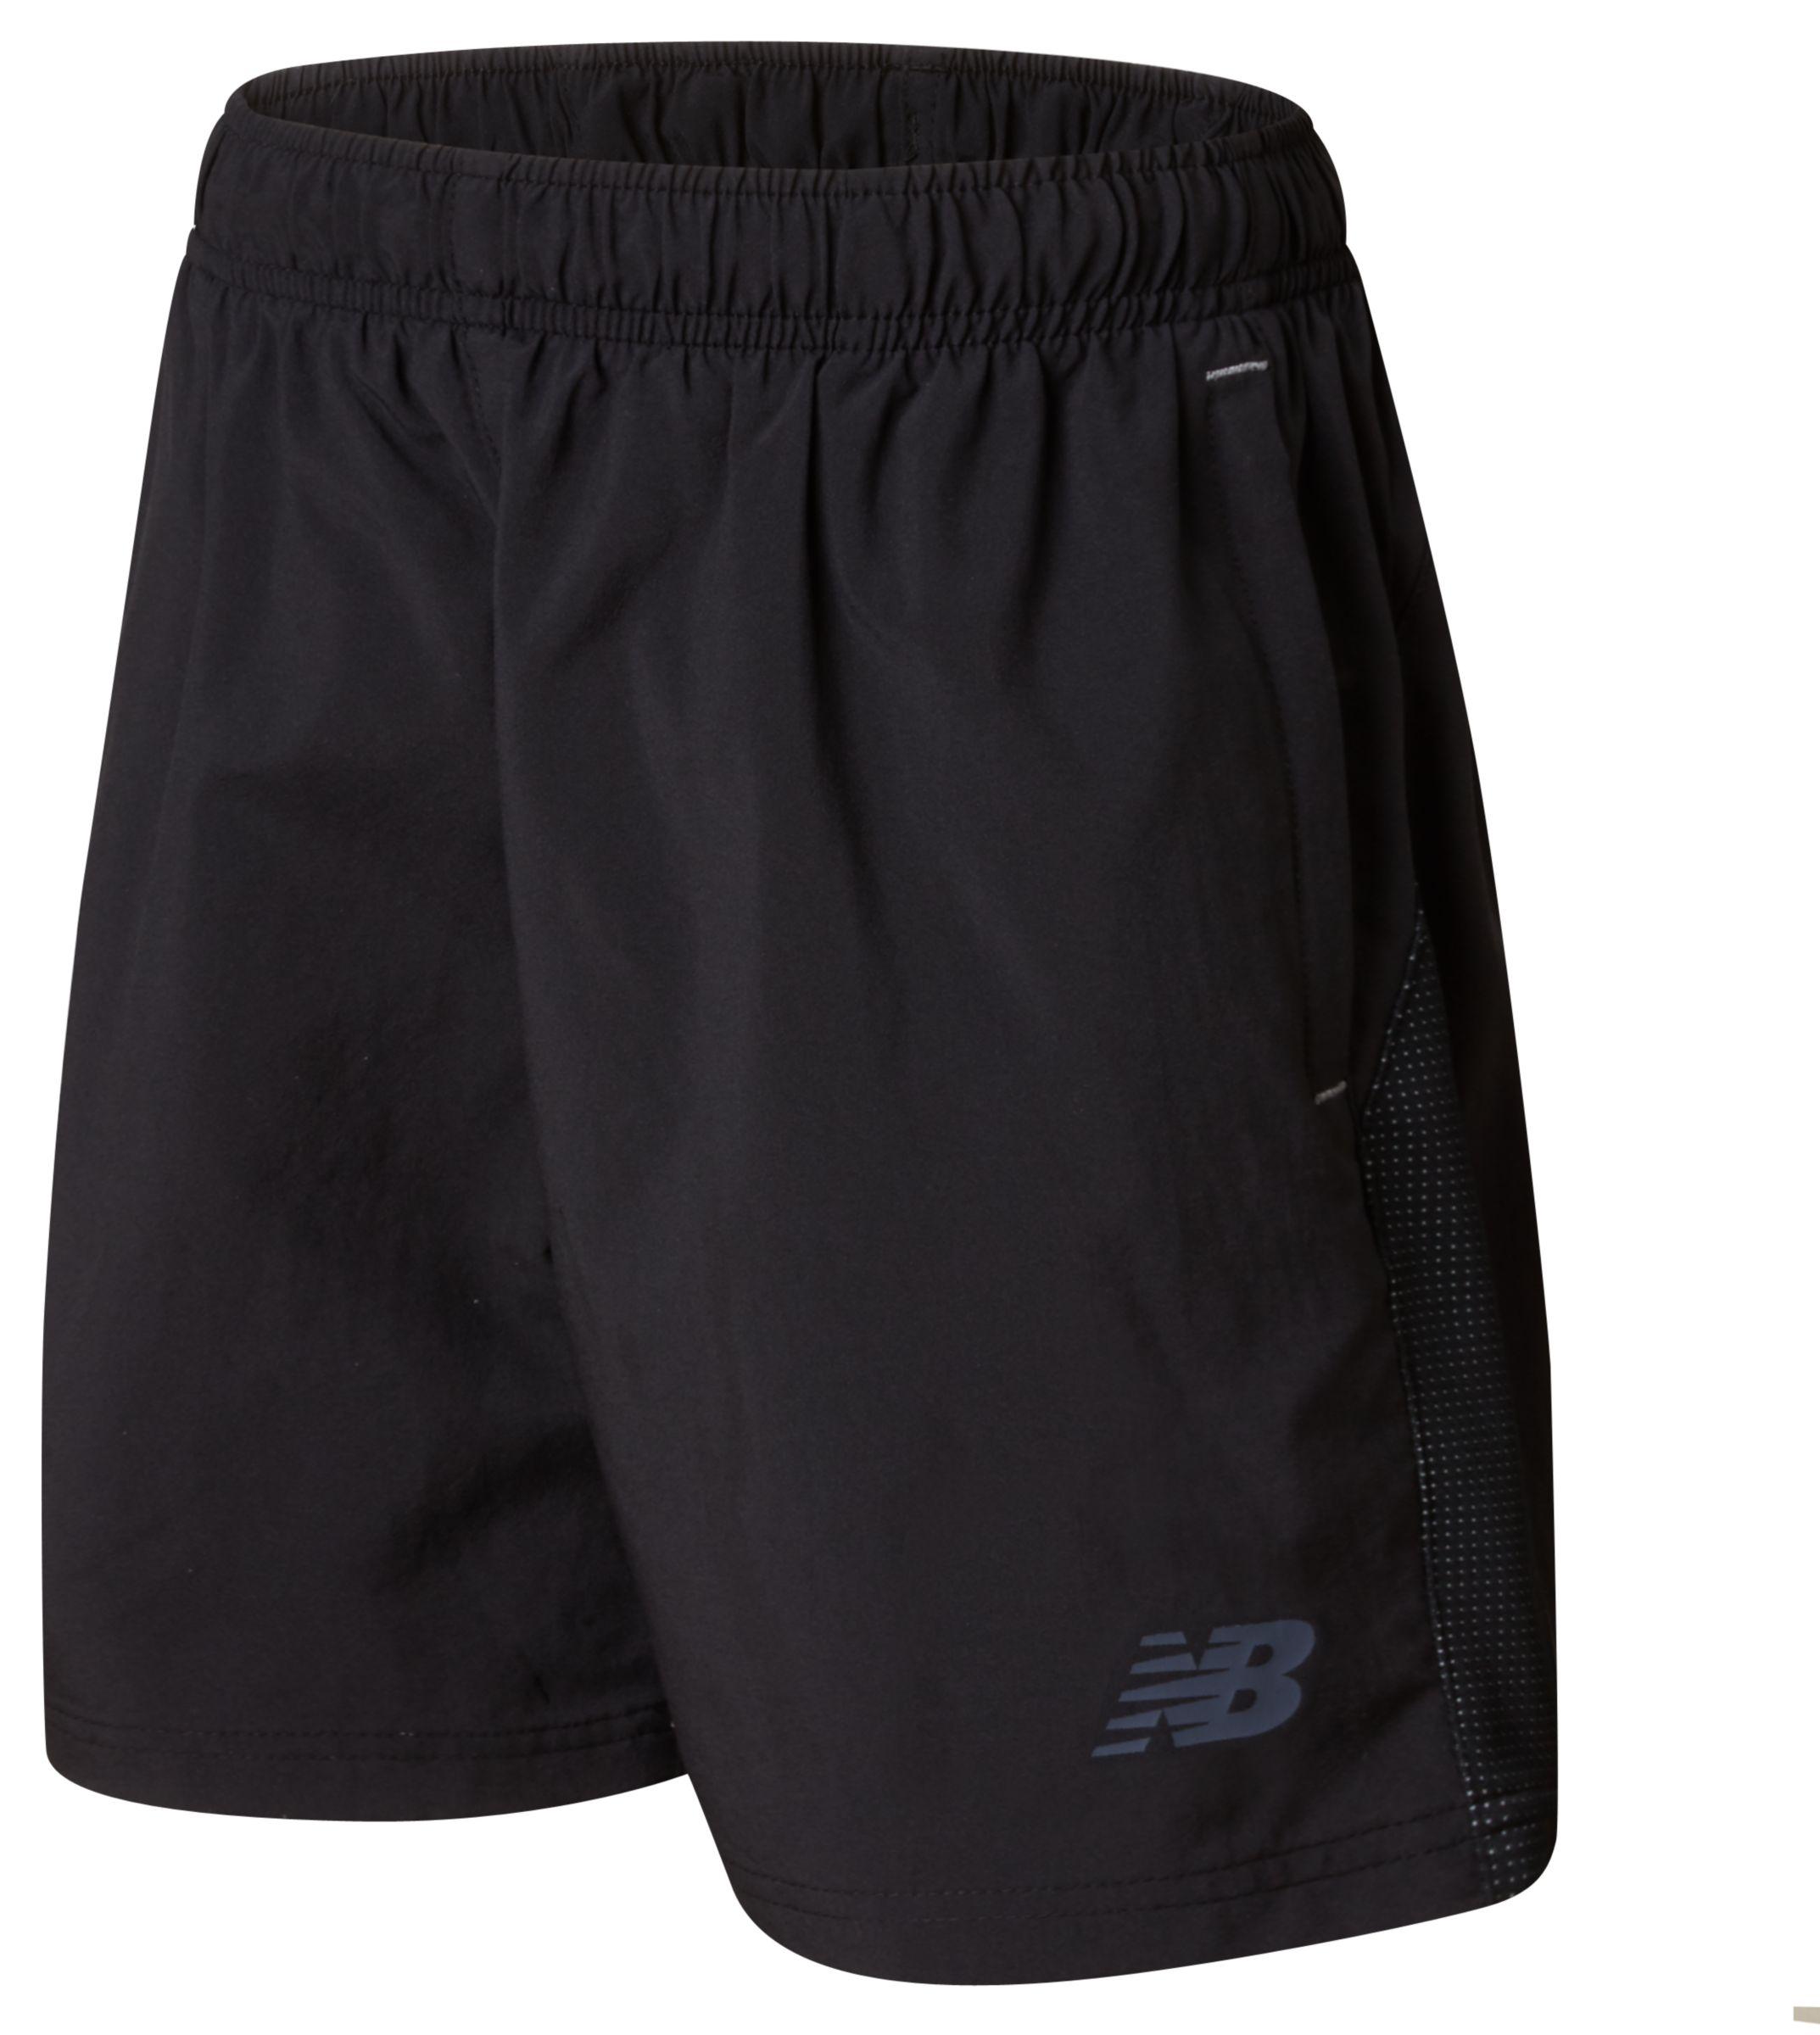 NB CFC Elite Training Woven Short, Black